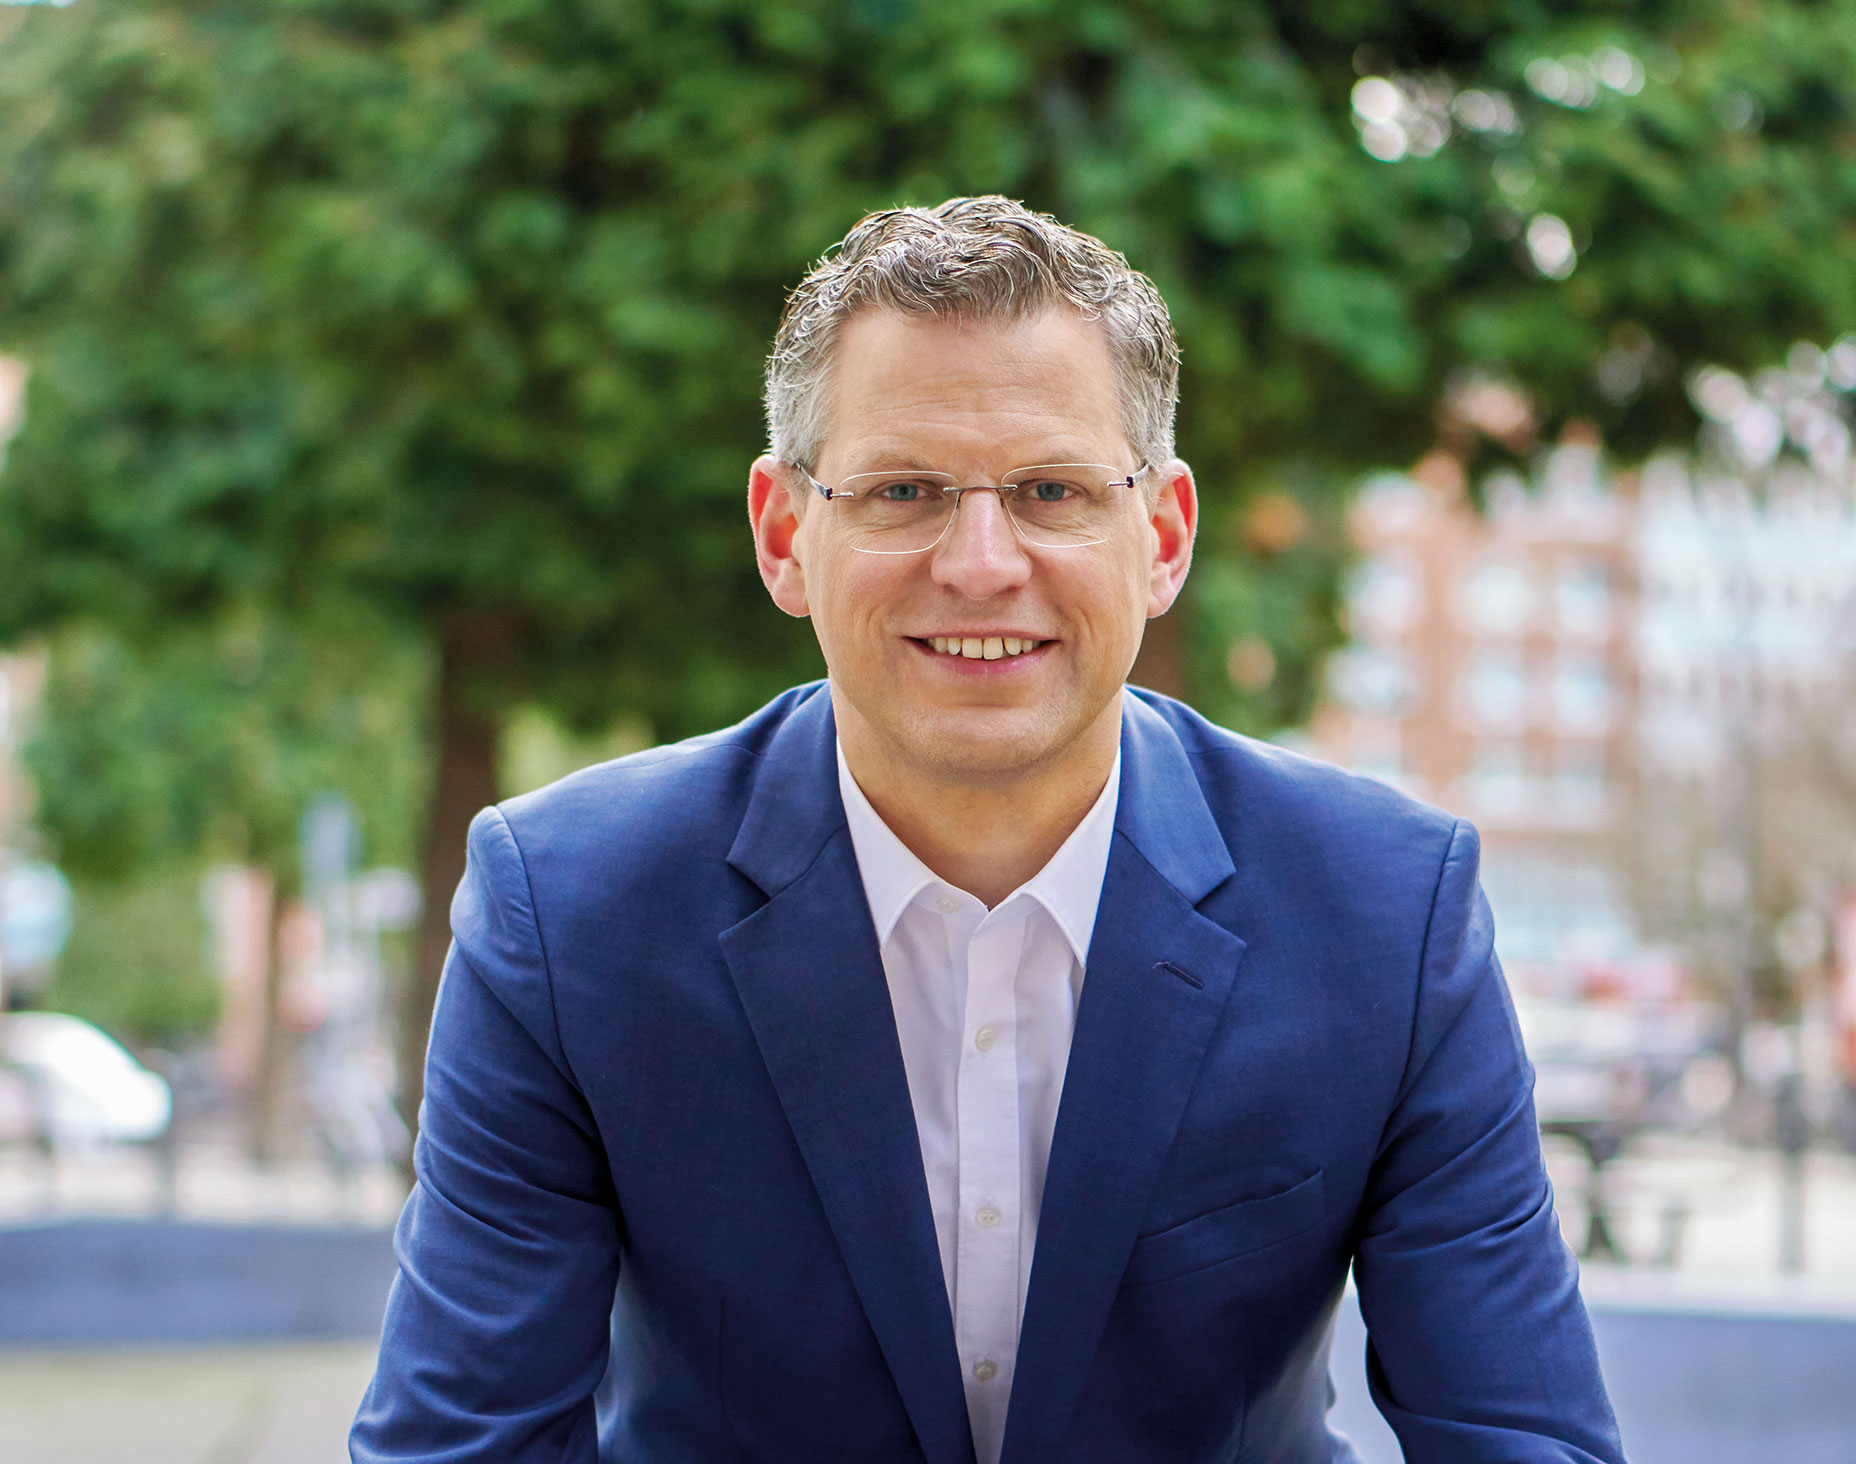 Pressefoto Christoph de Vries